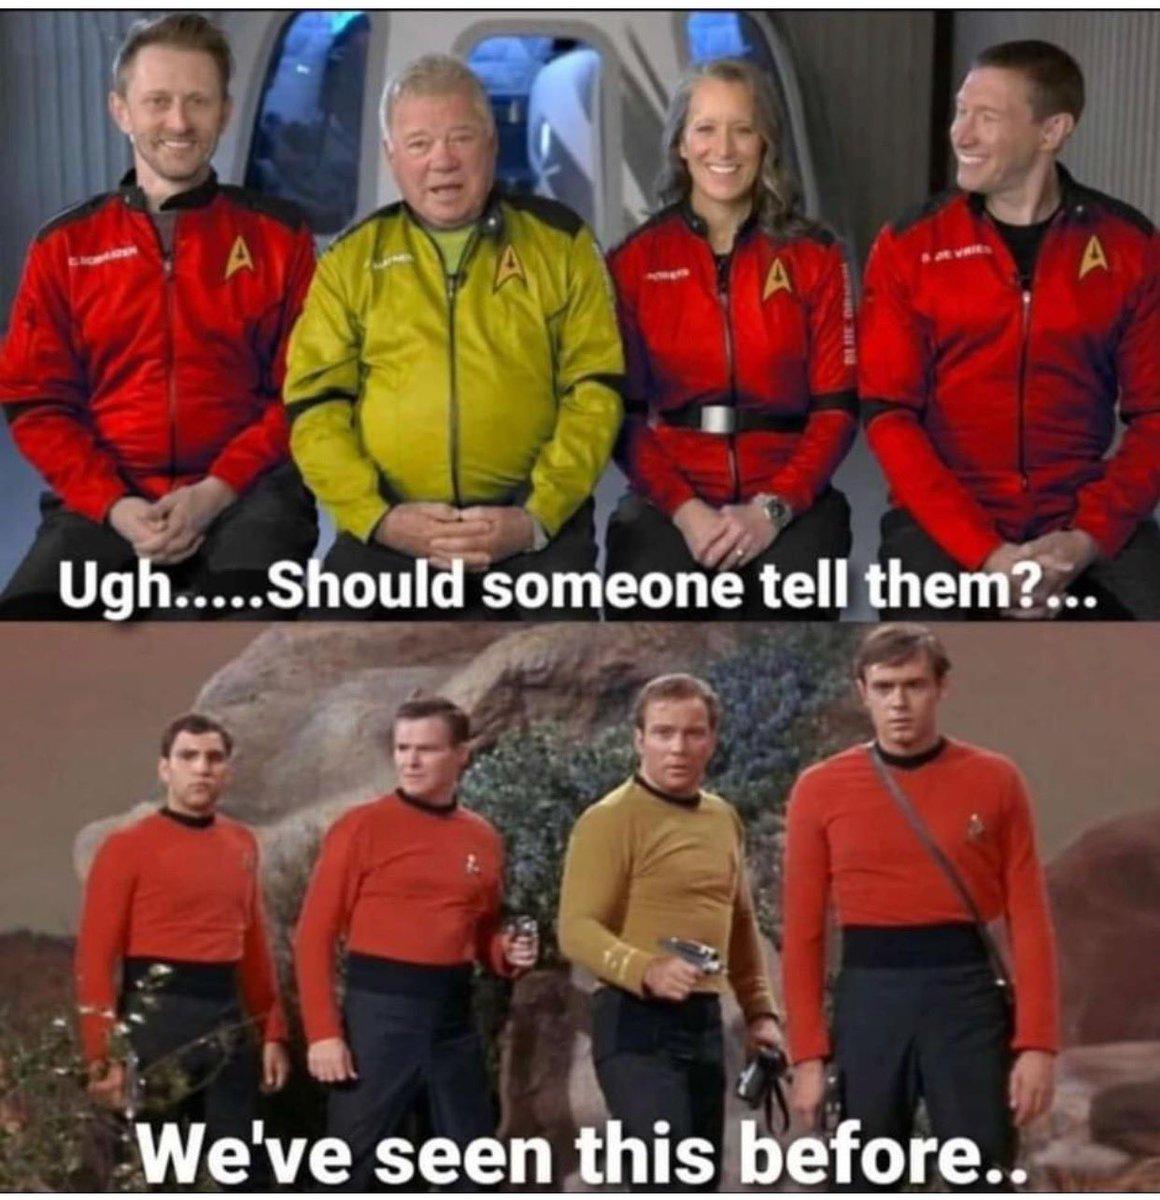 @MickLoze Not a GIF but… #WilliamShatner #spaceforce #RedShirt #CaptainKirk #StarTrek #FollowFriday